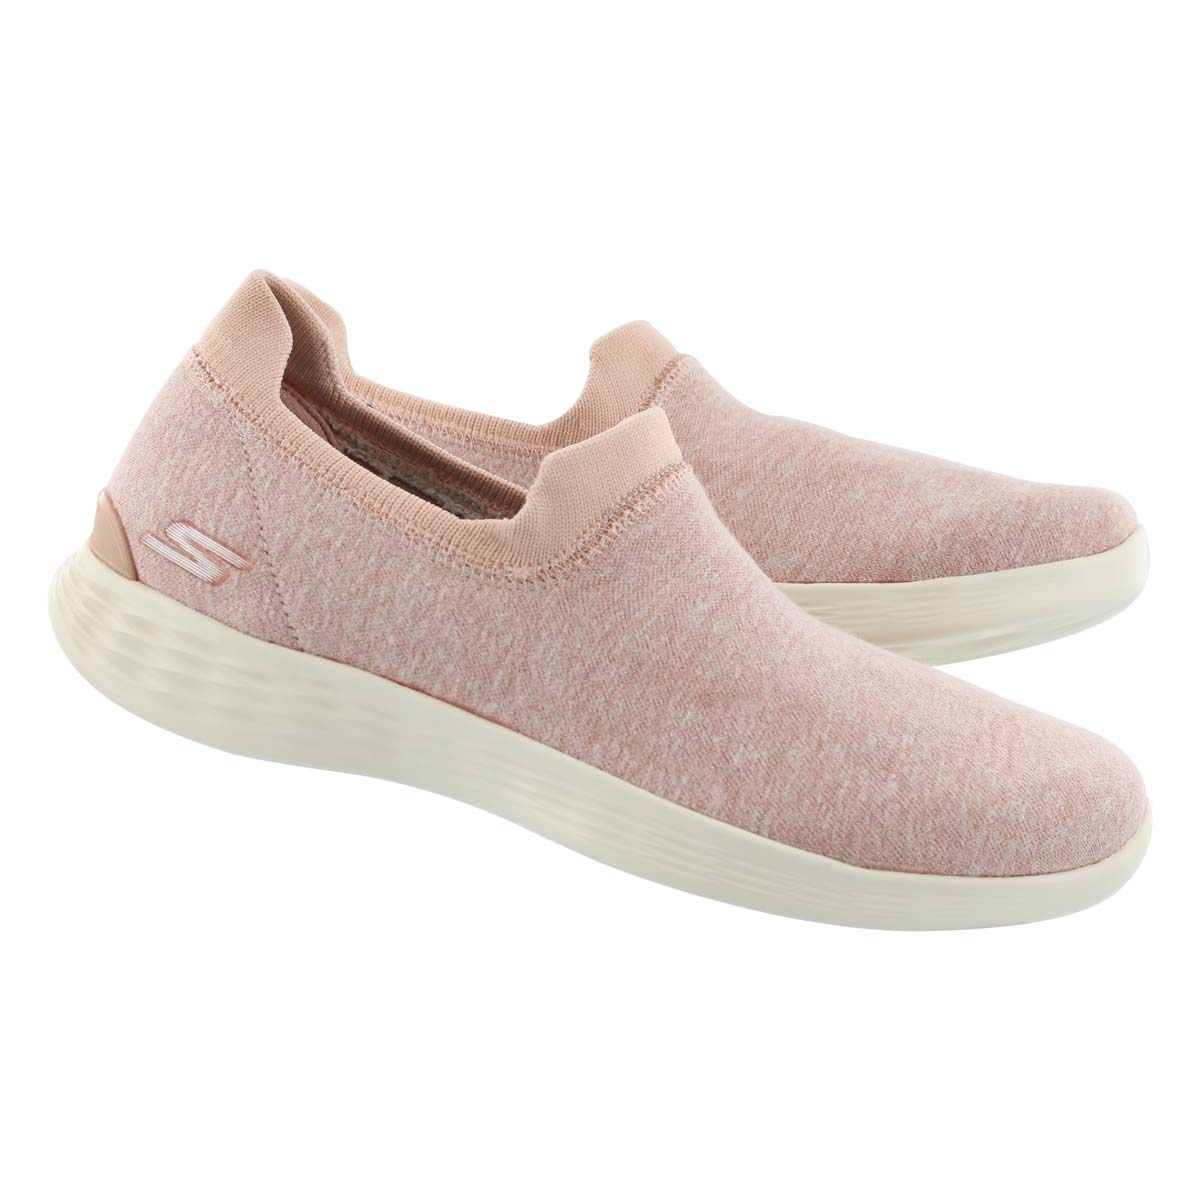 Lds You Define light pnk slip on shoe